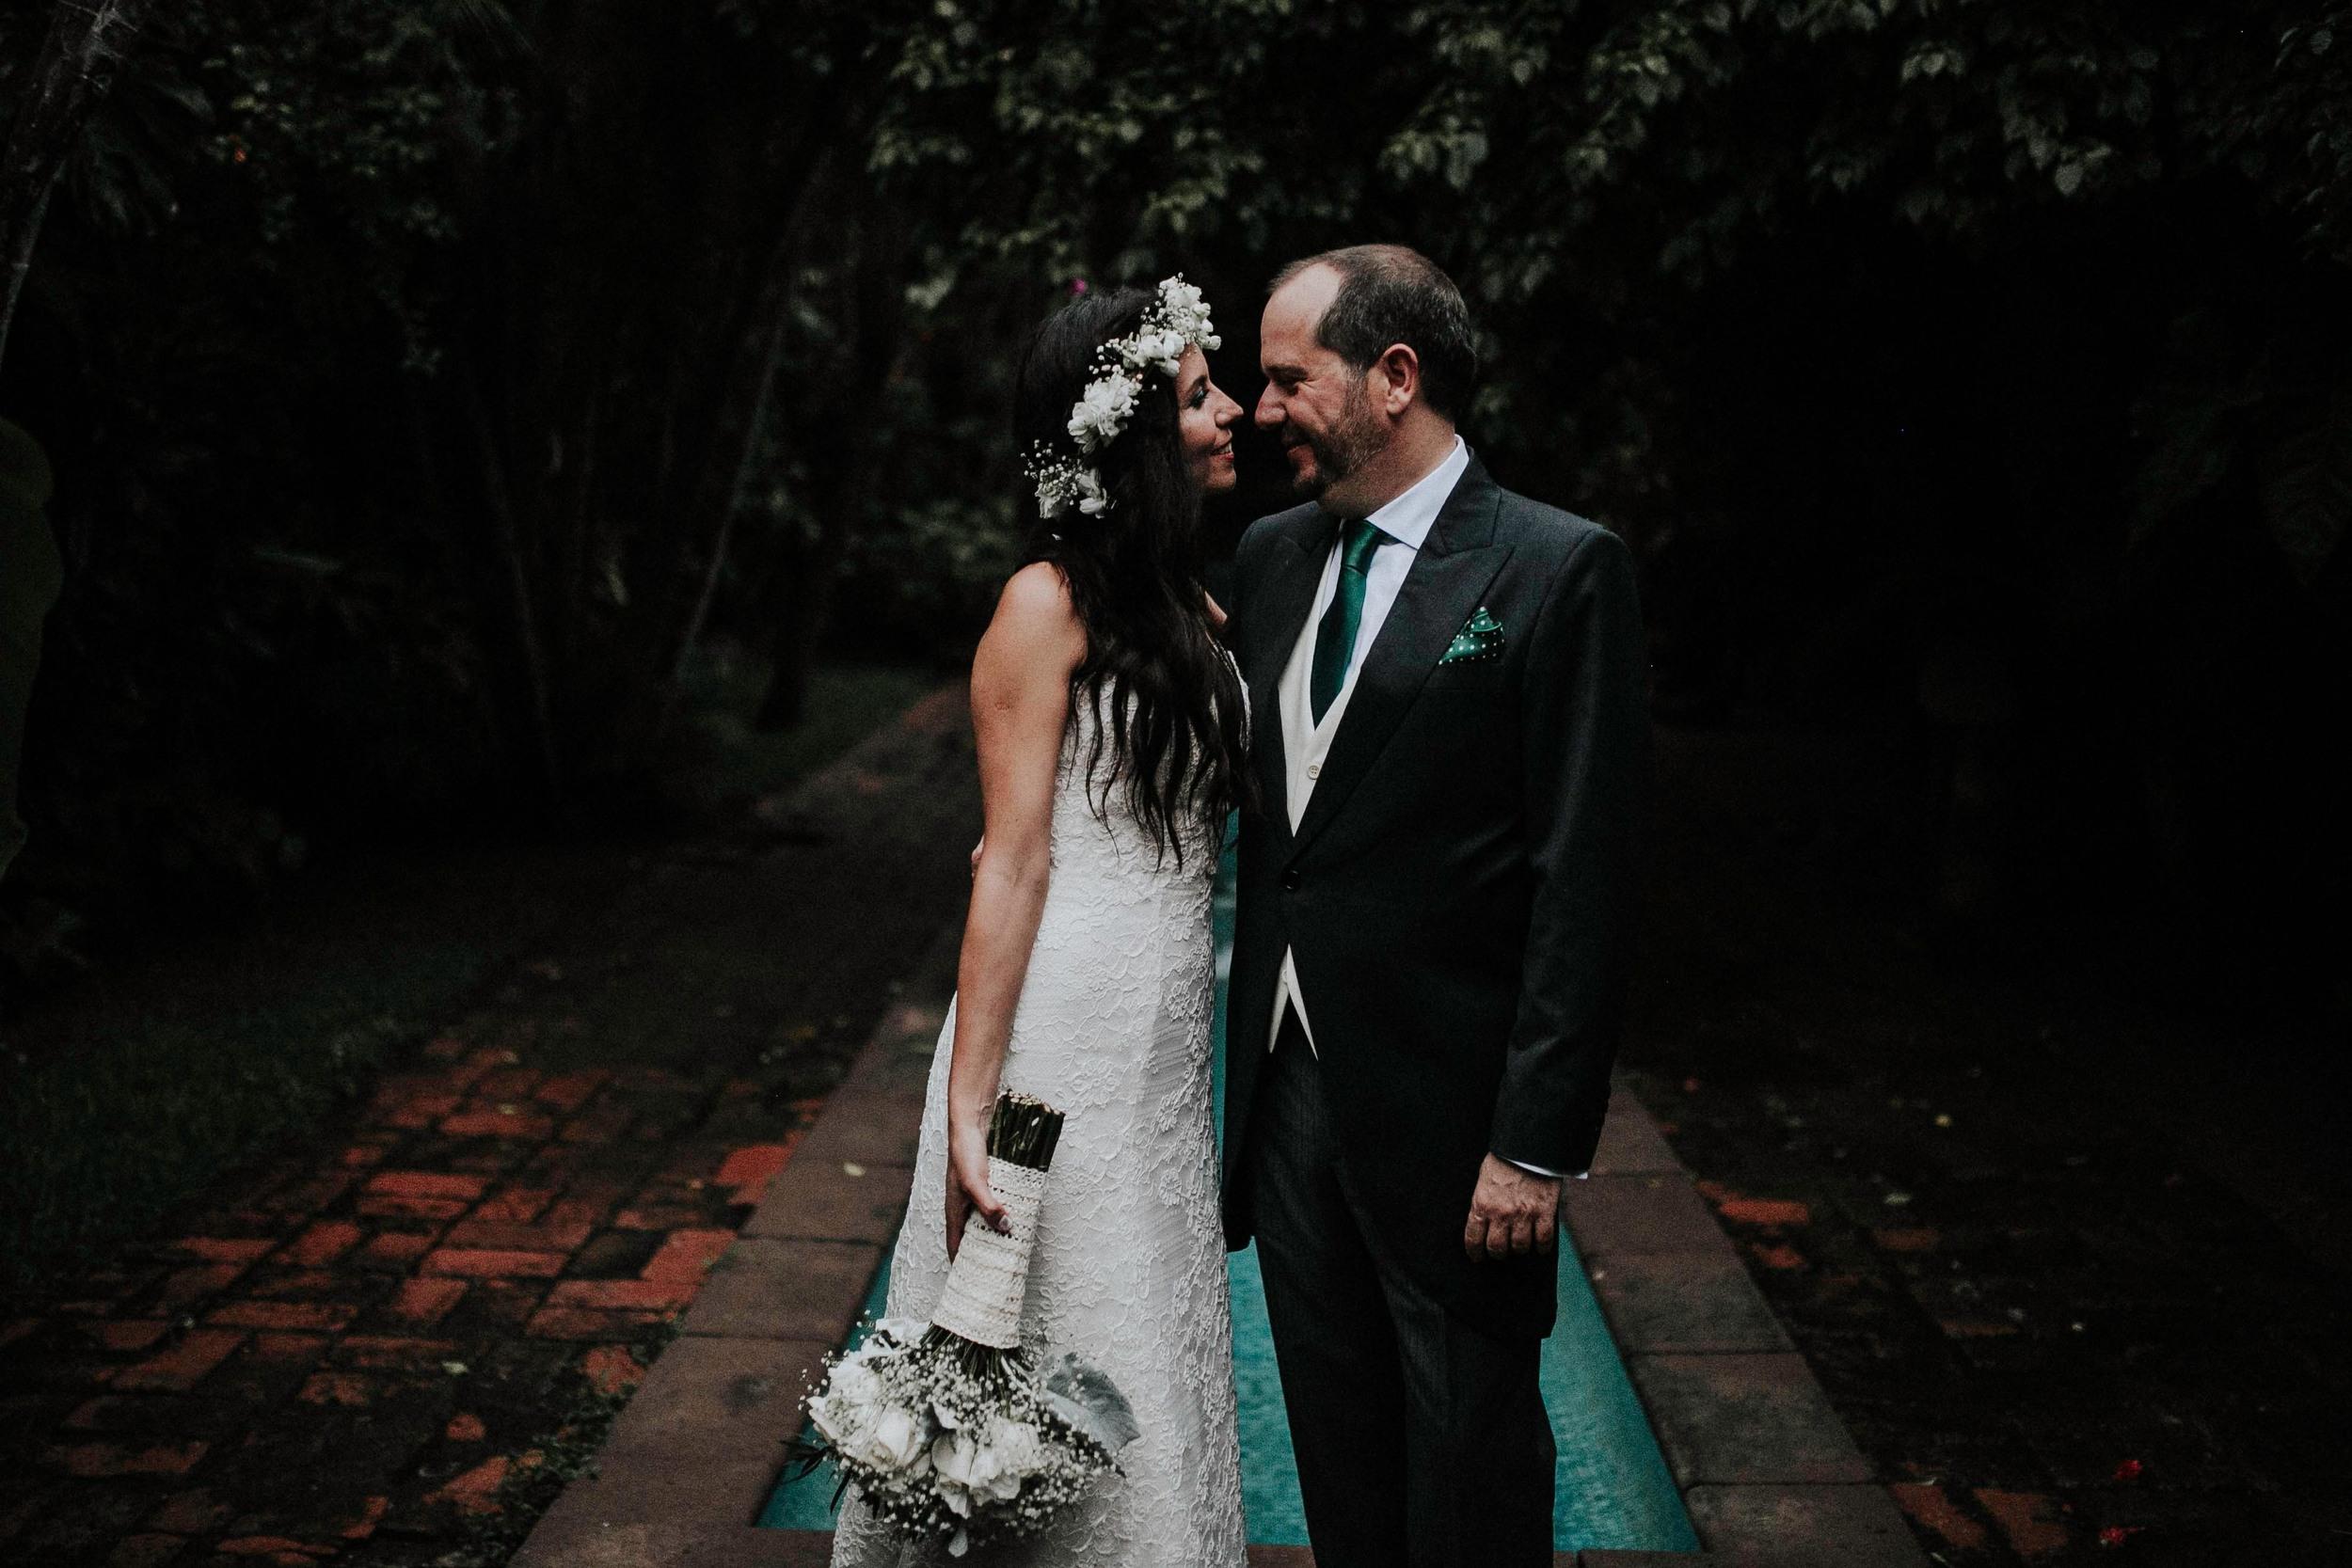 643A2496-Editaralfonso_flores_destination_wedding_photographer_San_gabriel_de_las_palmas.jpg